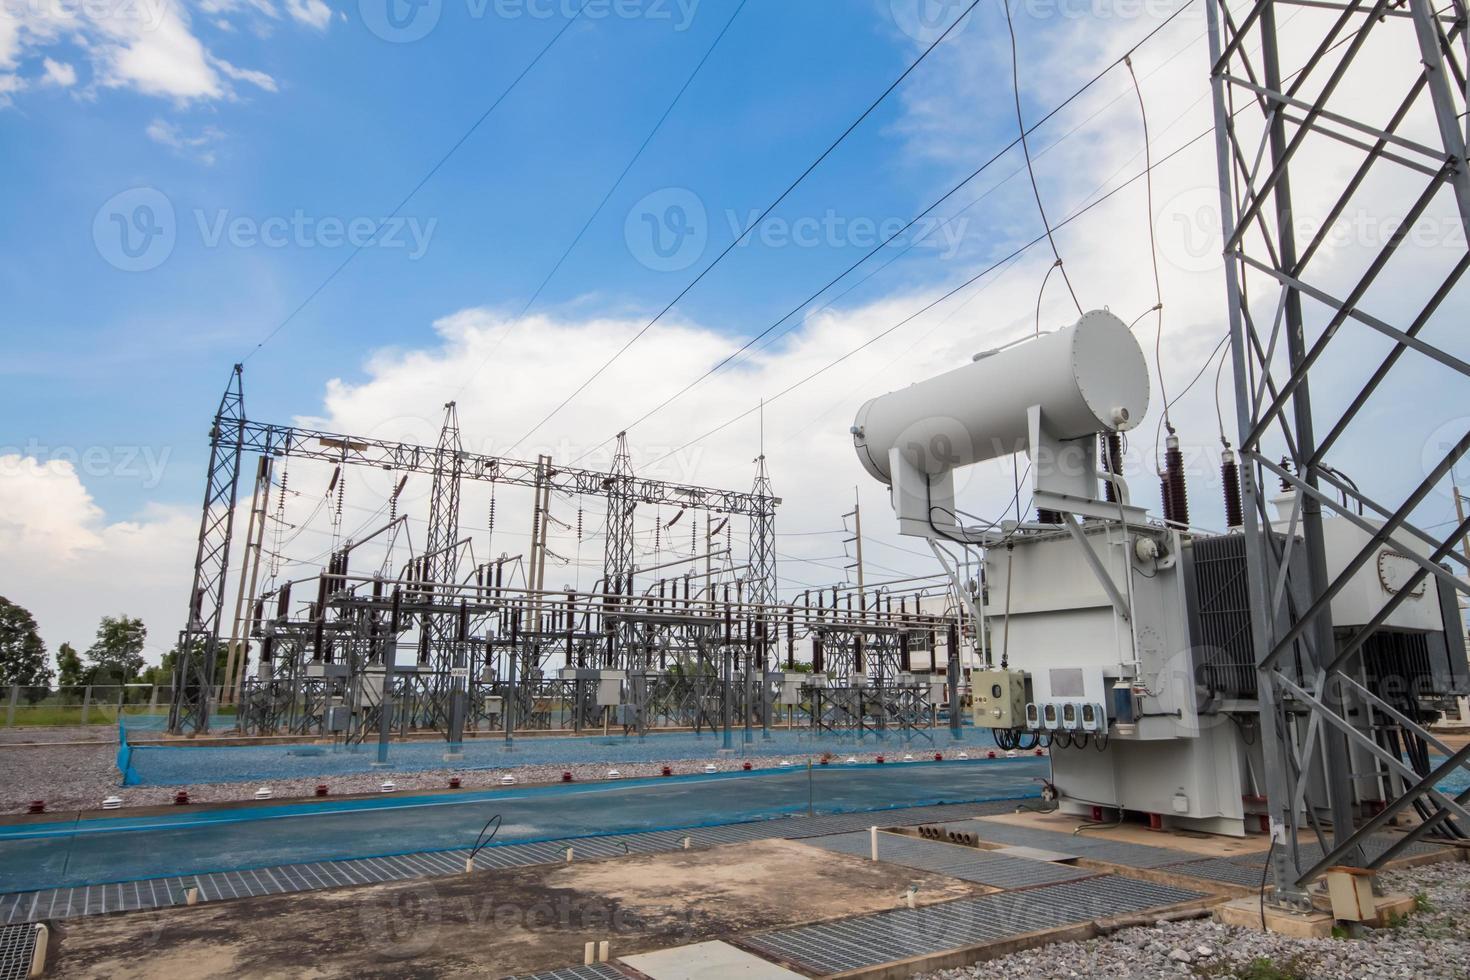 Leistungstransformator in der Unterstation 115 kV / 22 kV foto